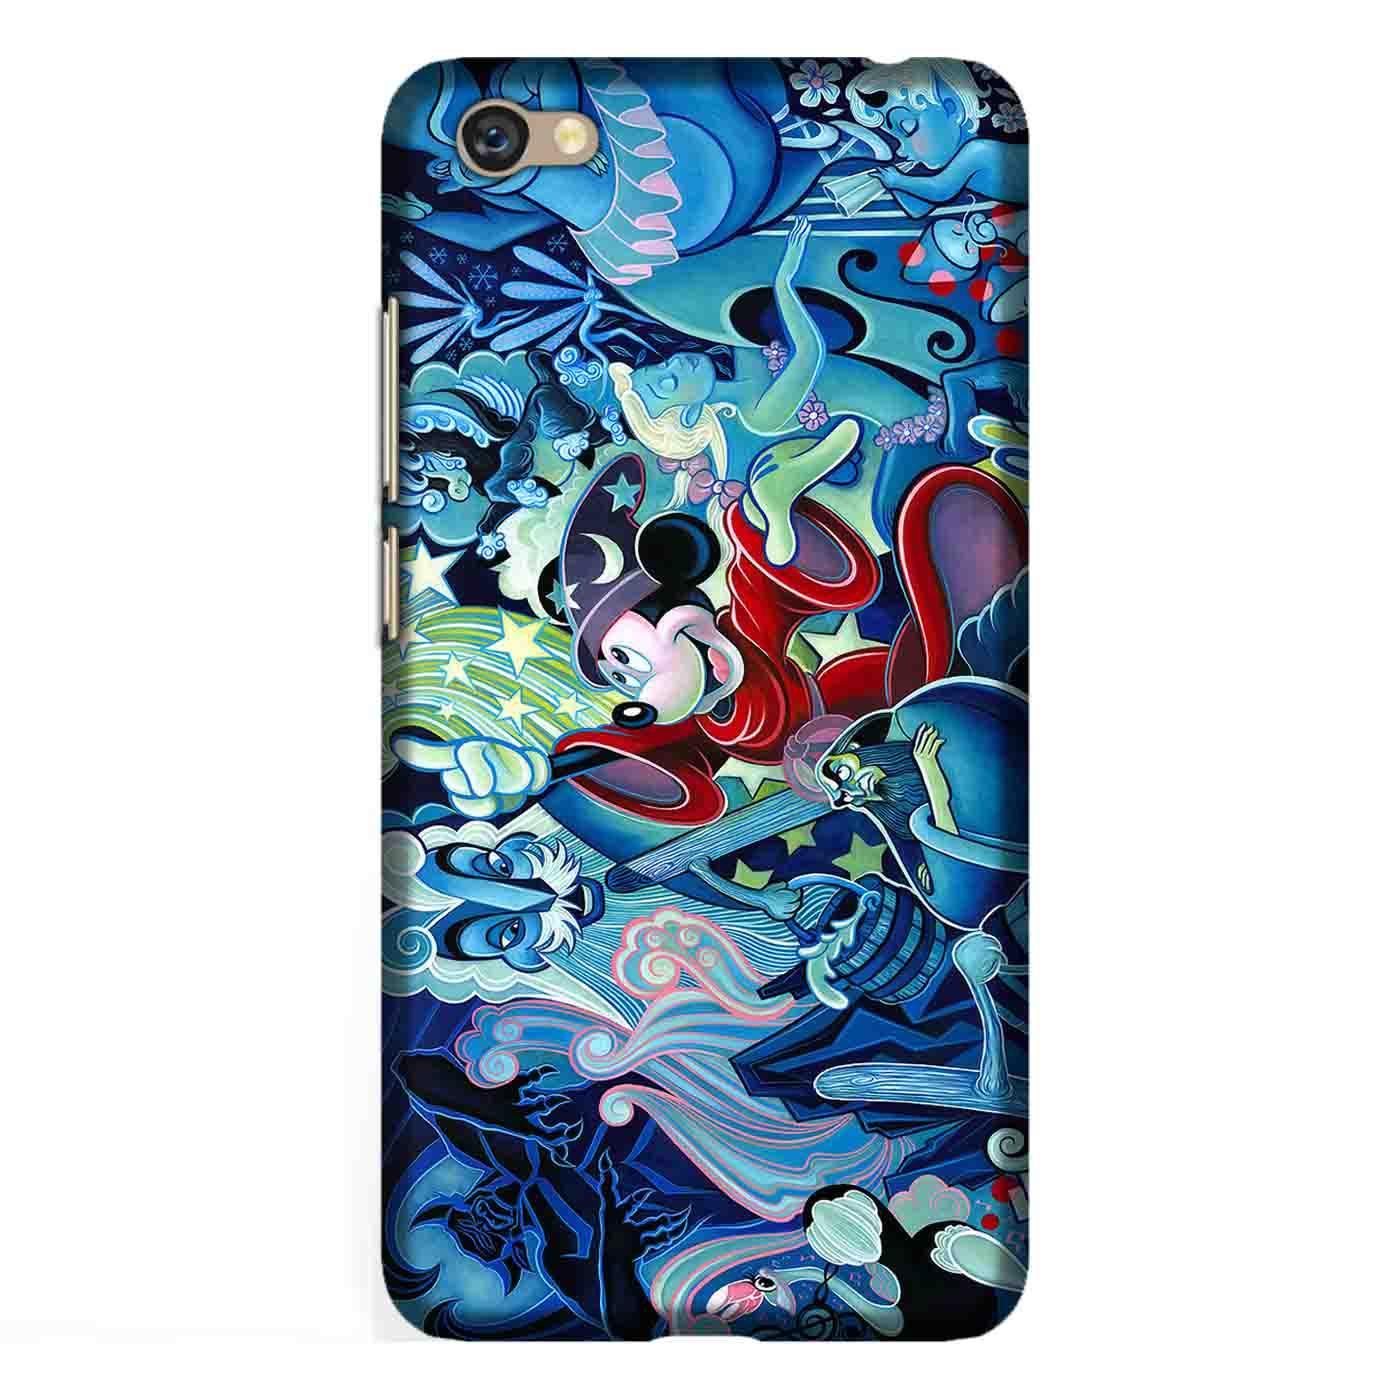 Casing Hardcase Bergambar Motif Mickey Mouse 4 untuk Handphone Xiaomi Redmi Note 5A Case Custom Full Print